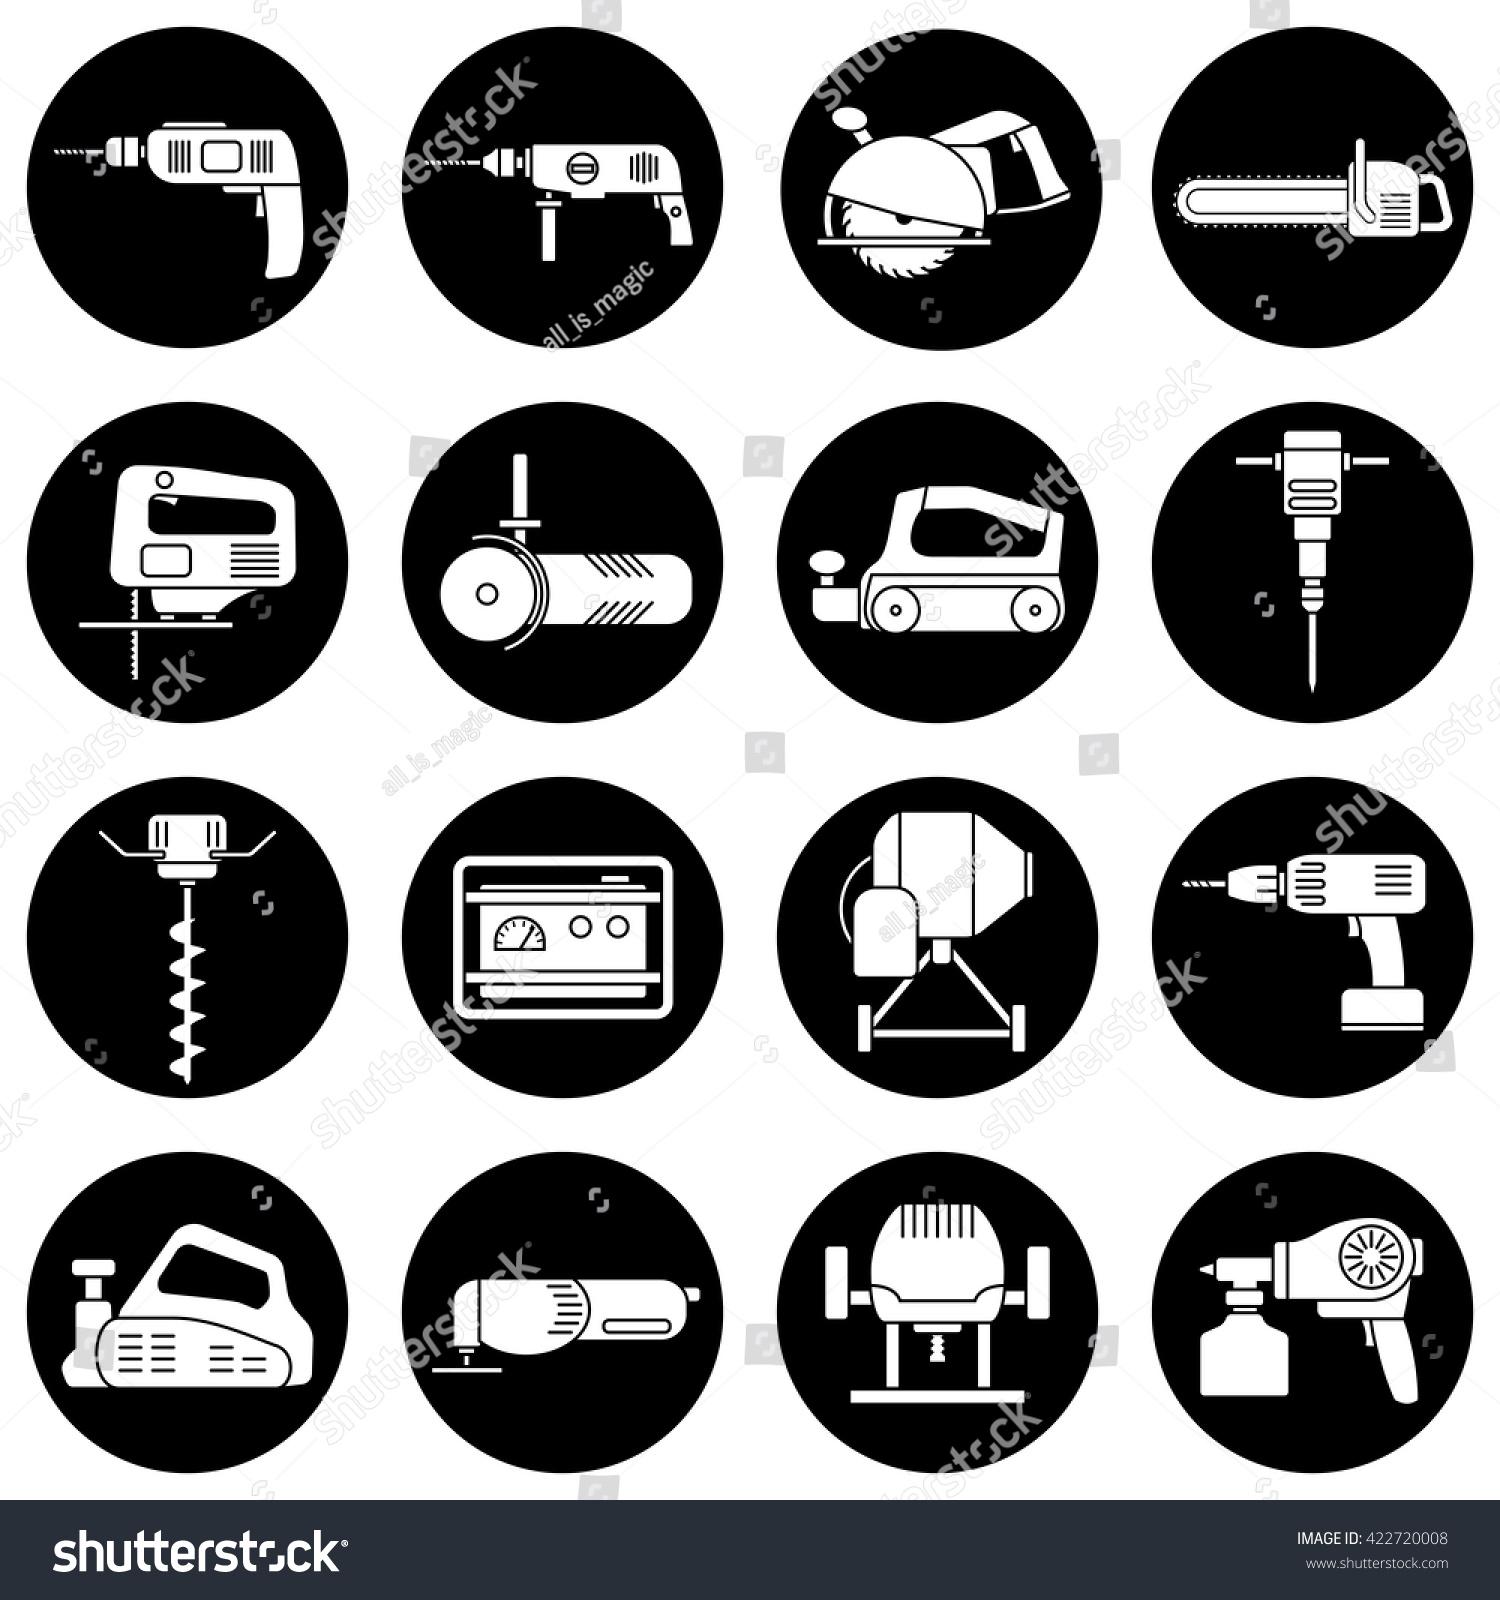 Tools - Set Of Isolated Icons. Black Pictogram On White Background ...